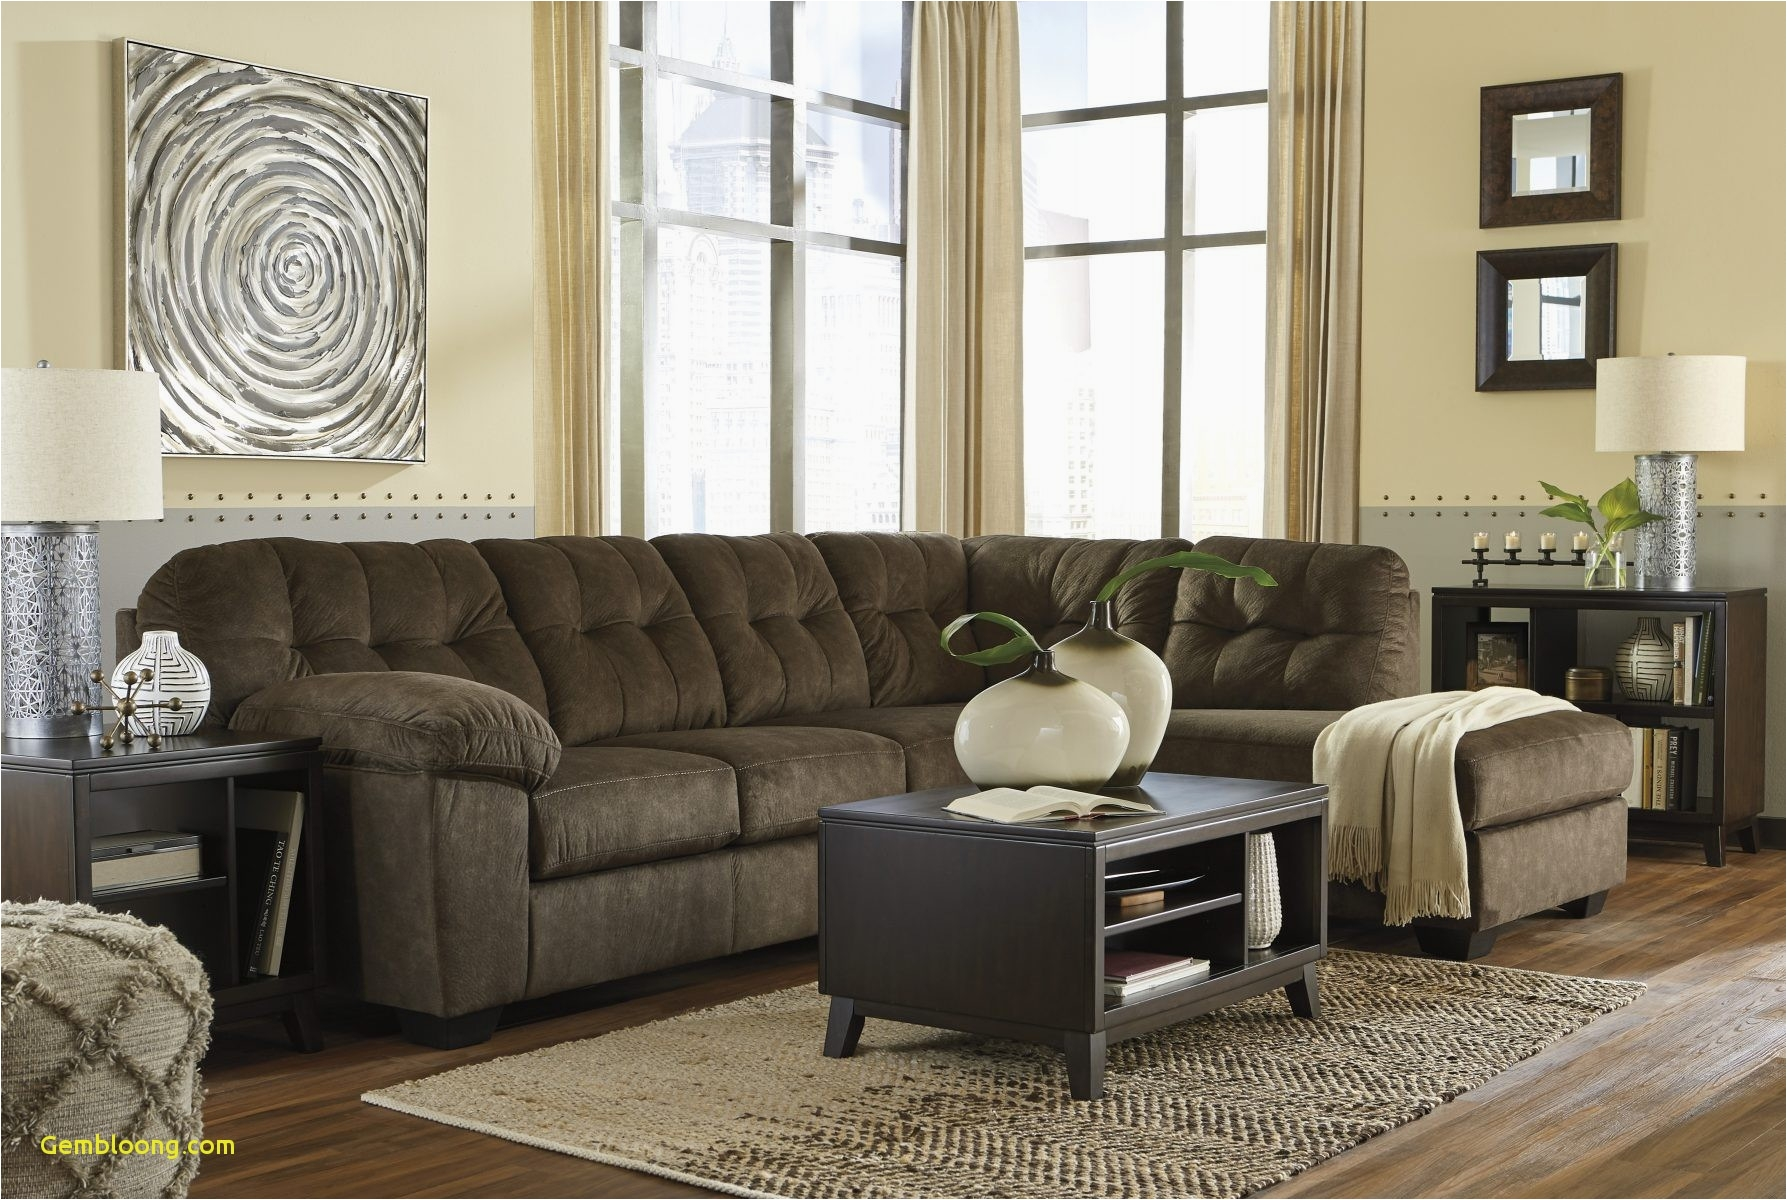 mor furniture for less phoenix az new 9 over night ashley furniture north shore bedroom stock